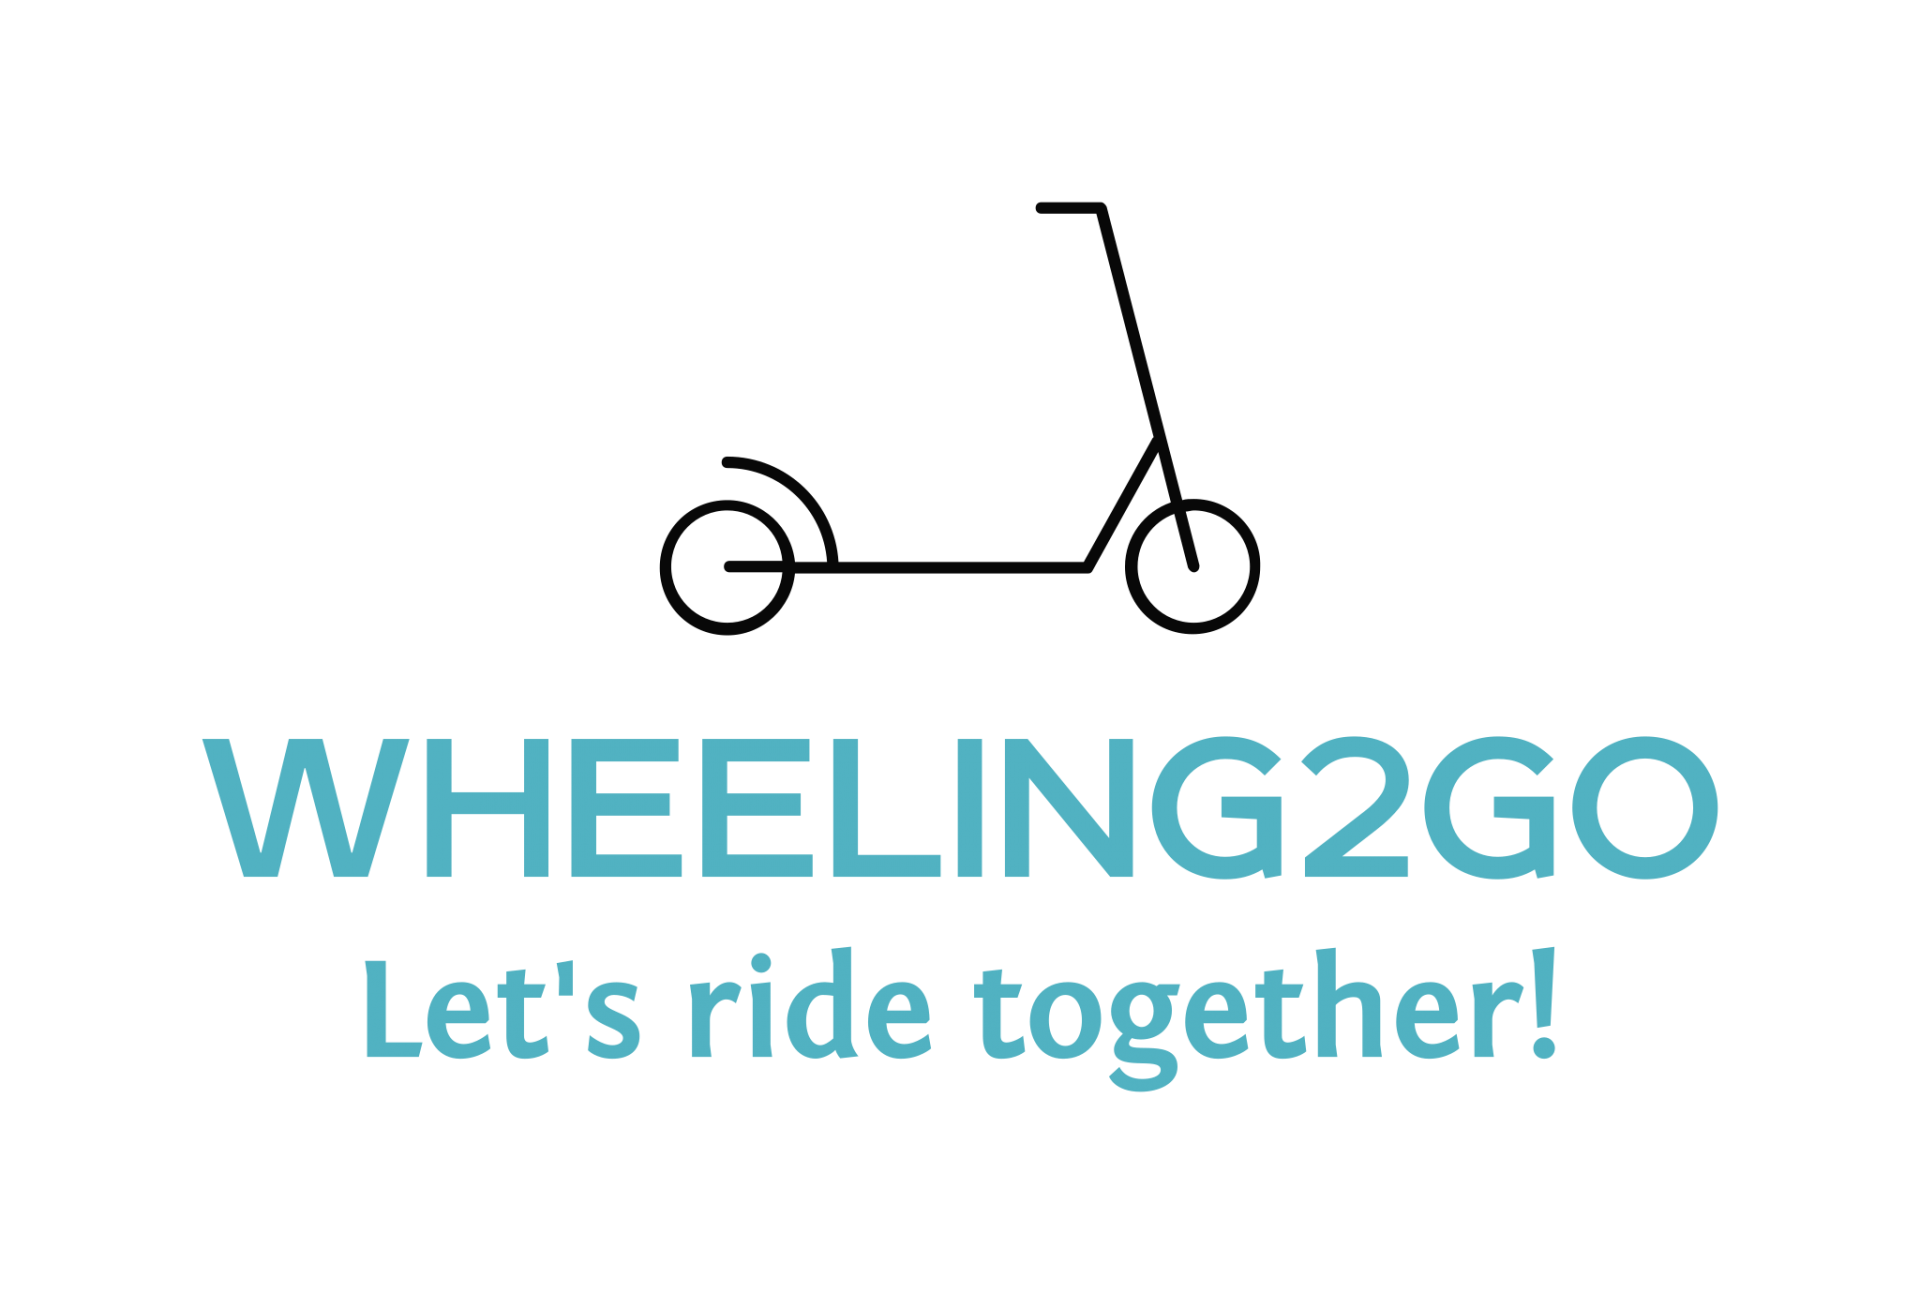 Wheeling2Go, Lda